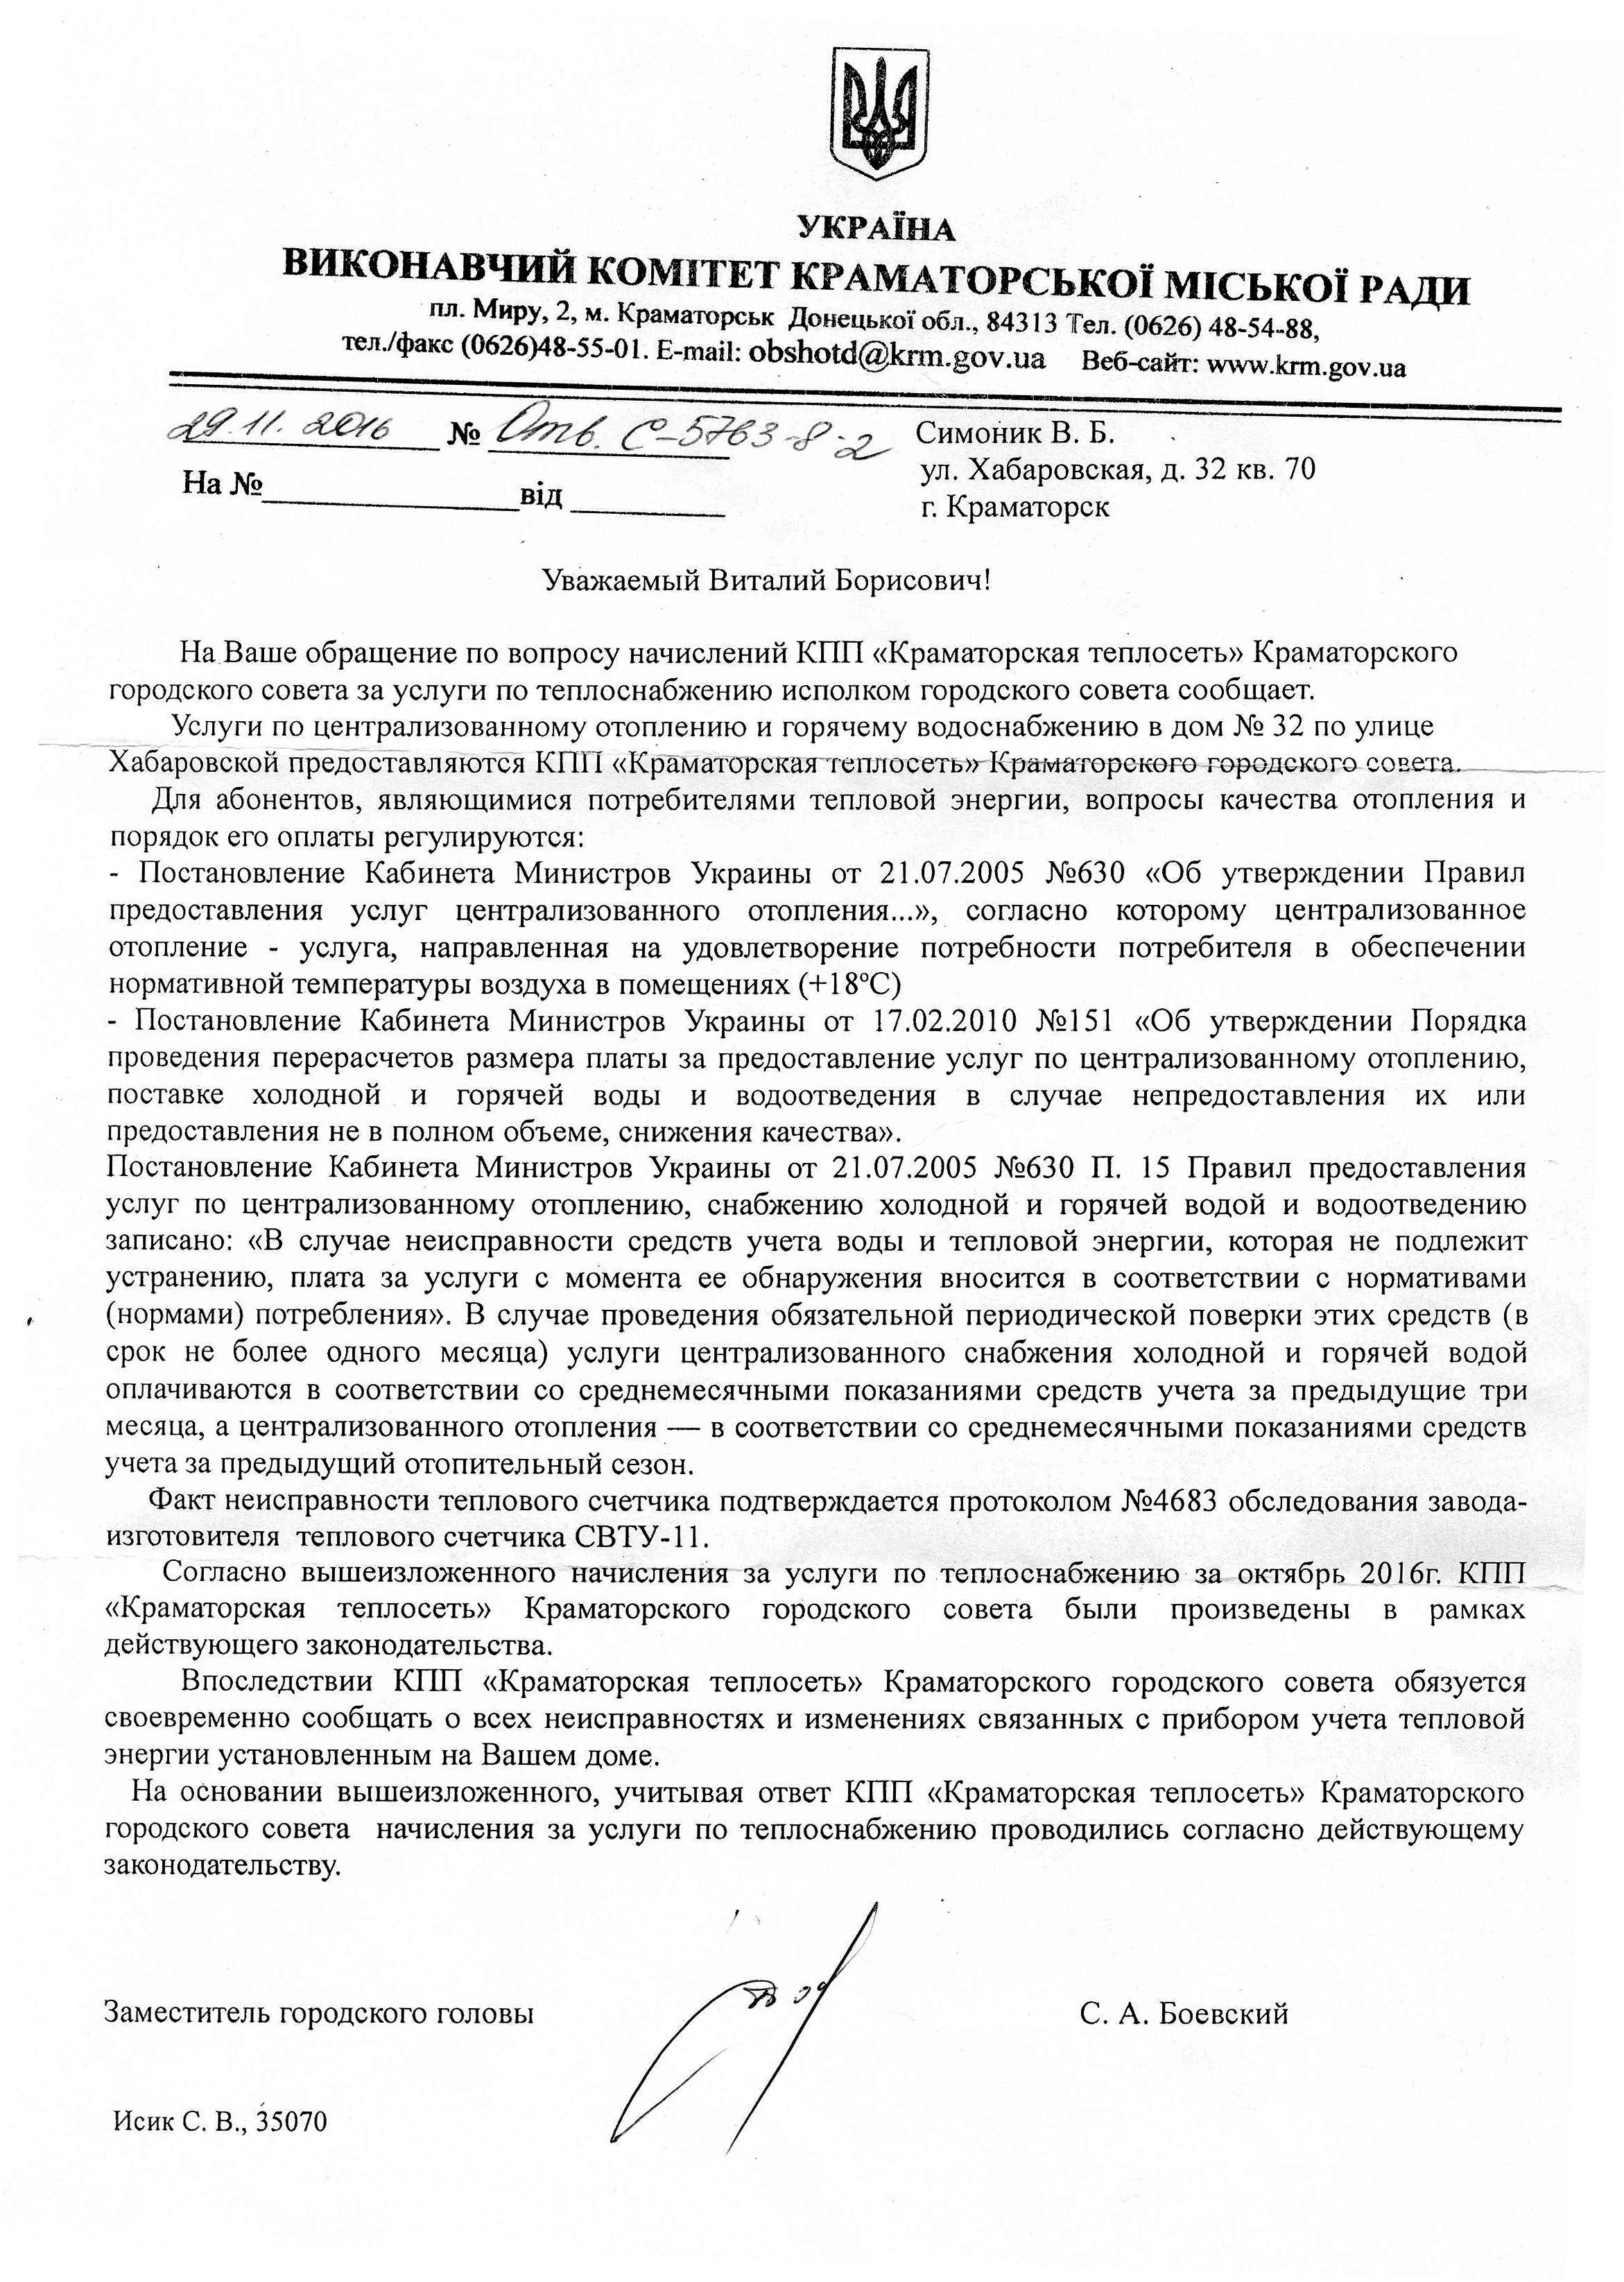 https://img-fotki.yandex.ru/get/60436/248142895.0/0_180fb0_4cc5ef7c_orig